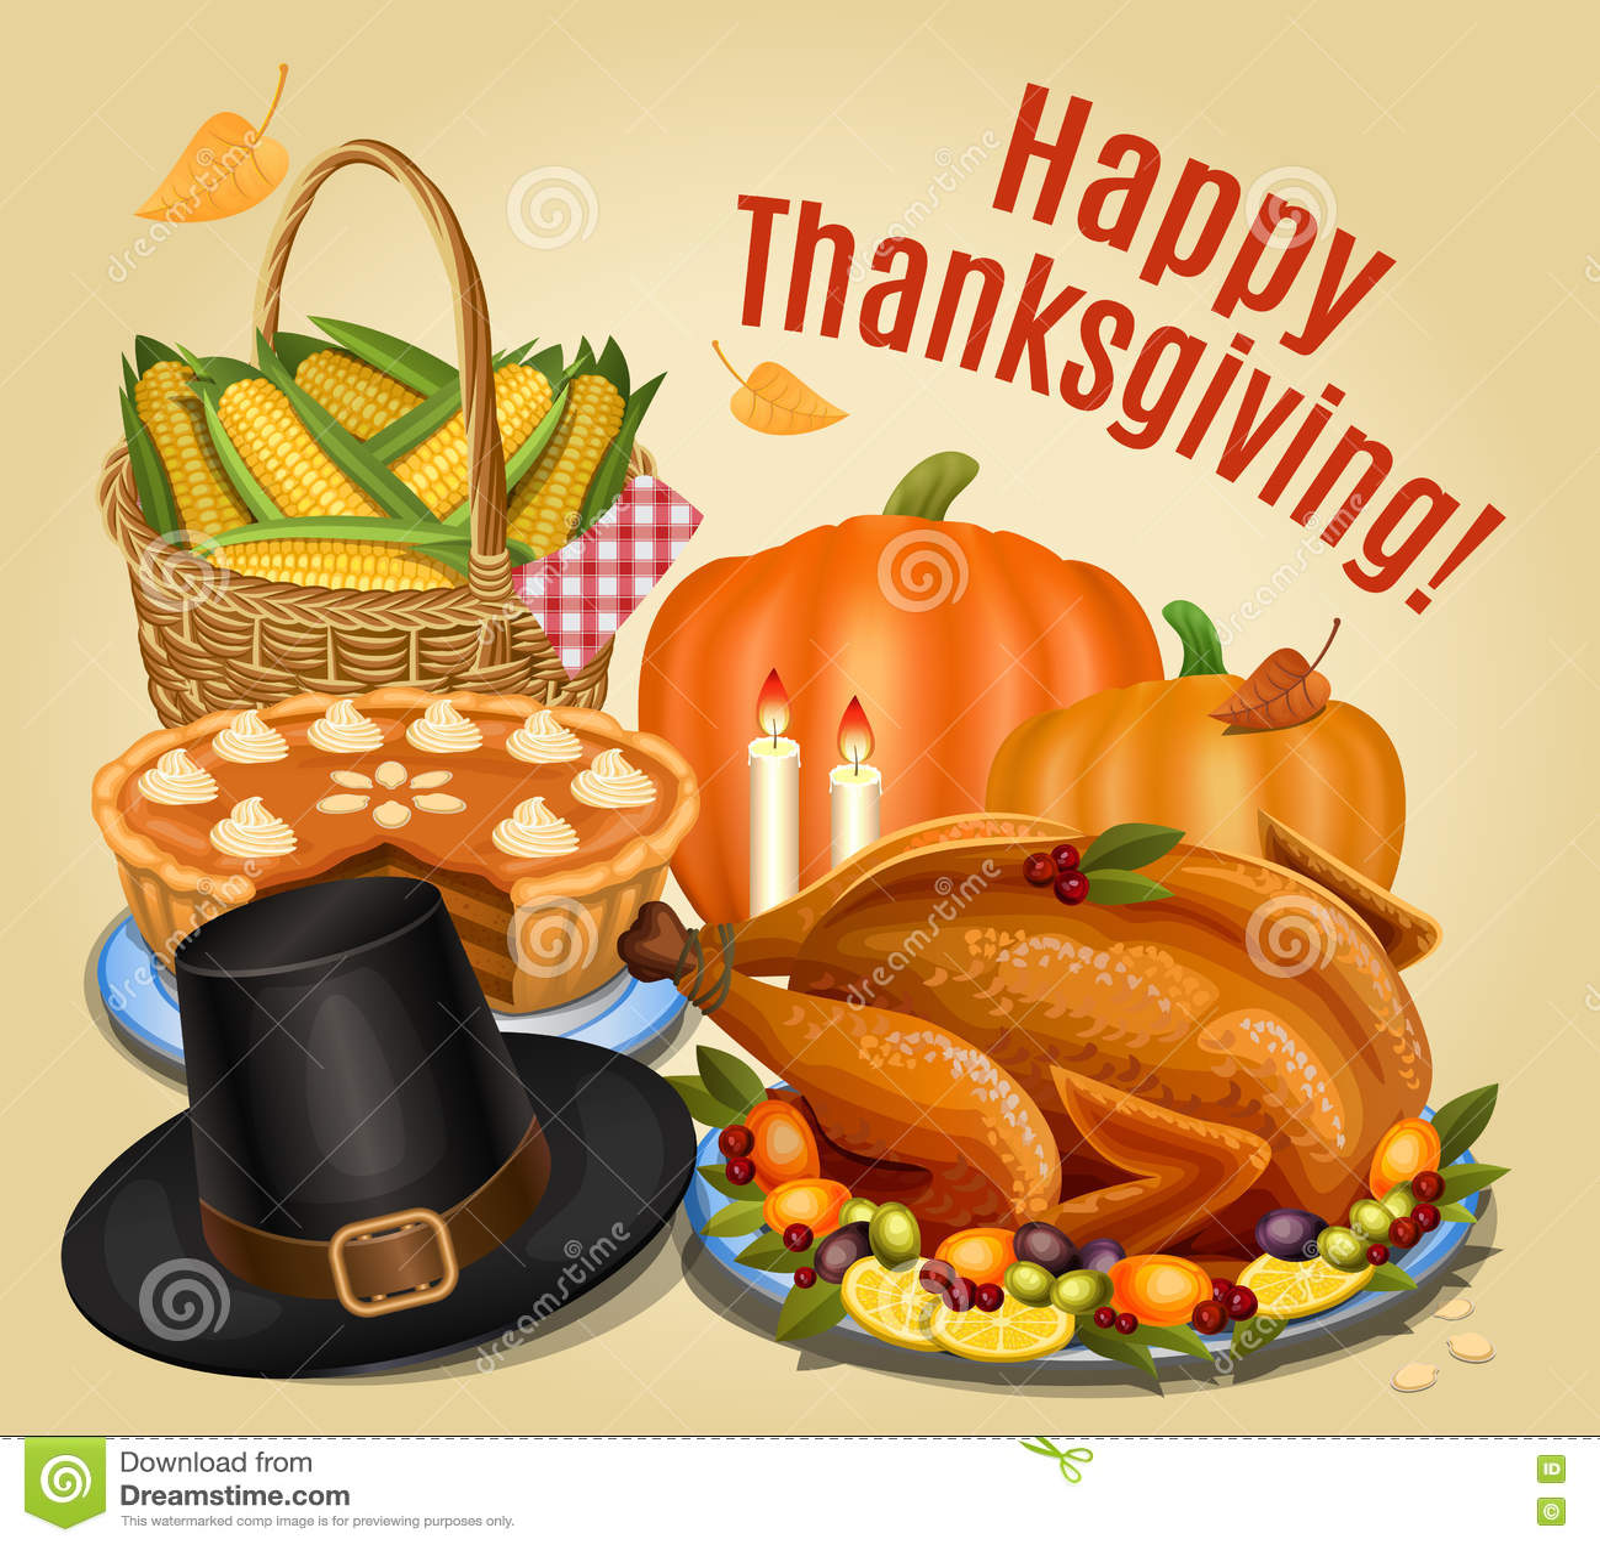 Thanksgiving Dinner Roast Turkey On Platter With Garnish